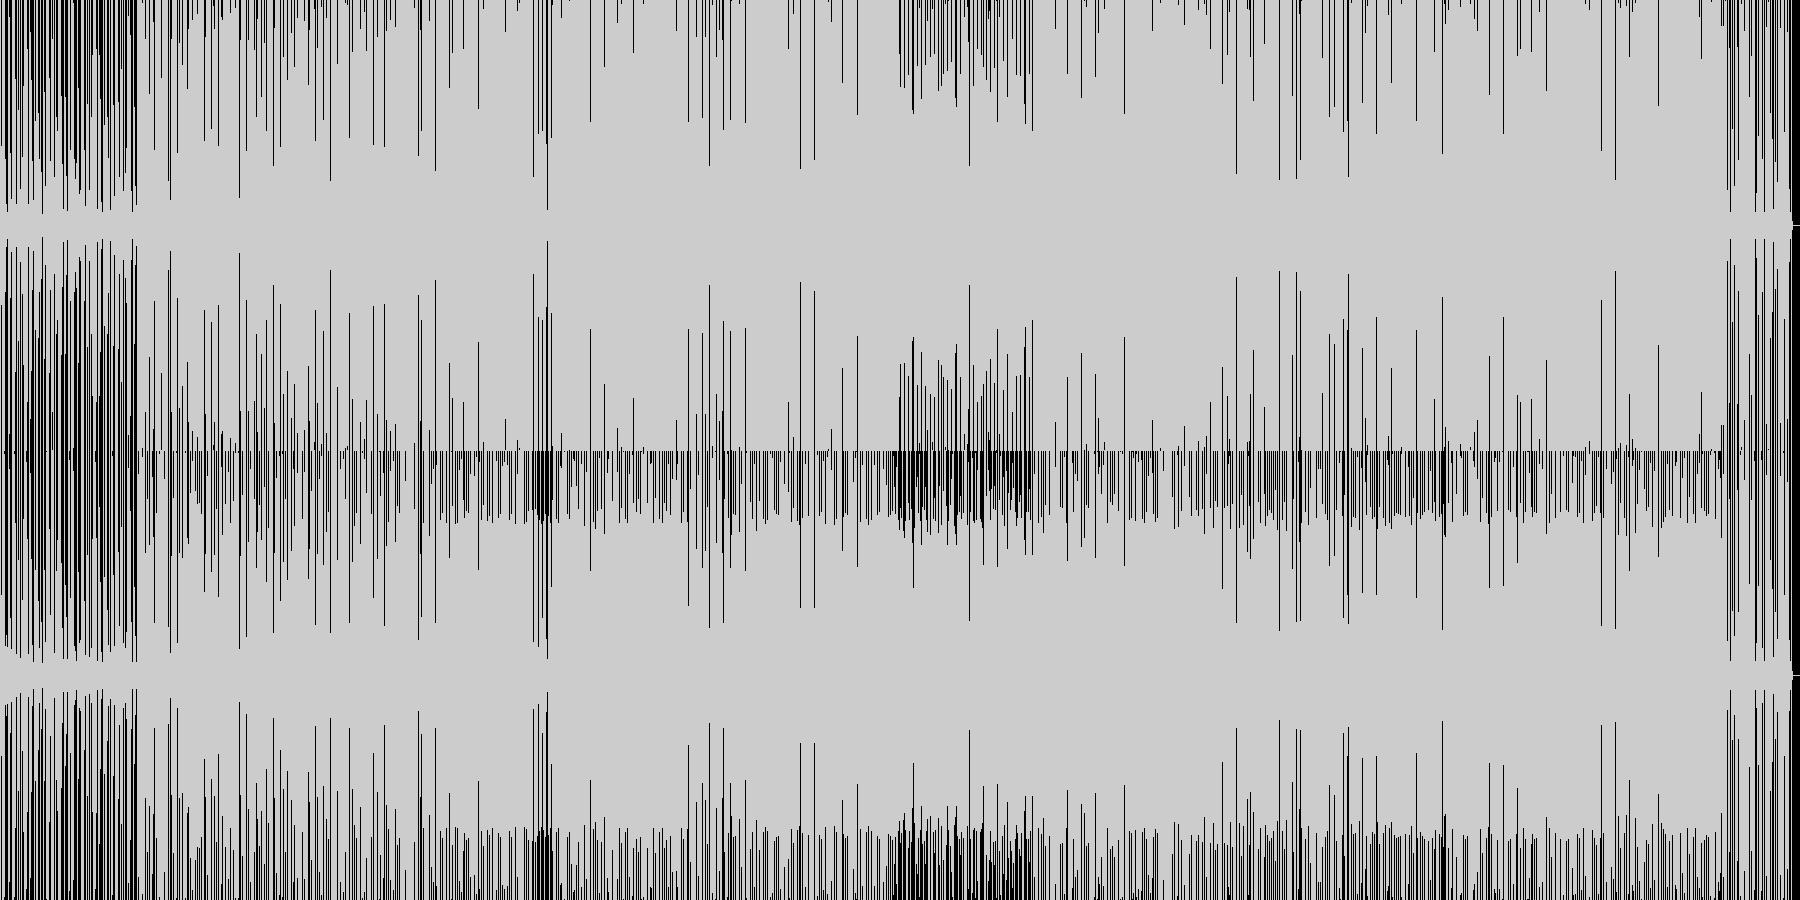 minimal house 26 の未再生の波形